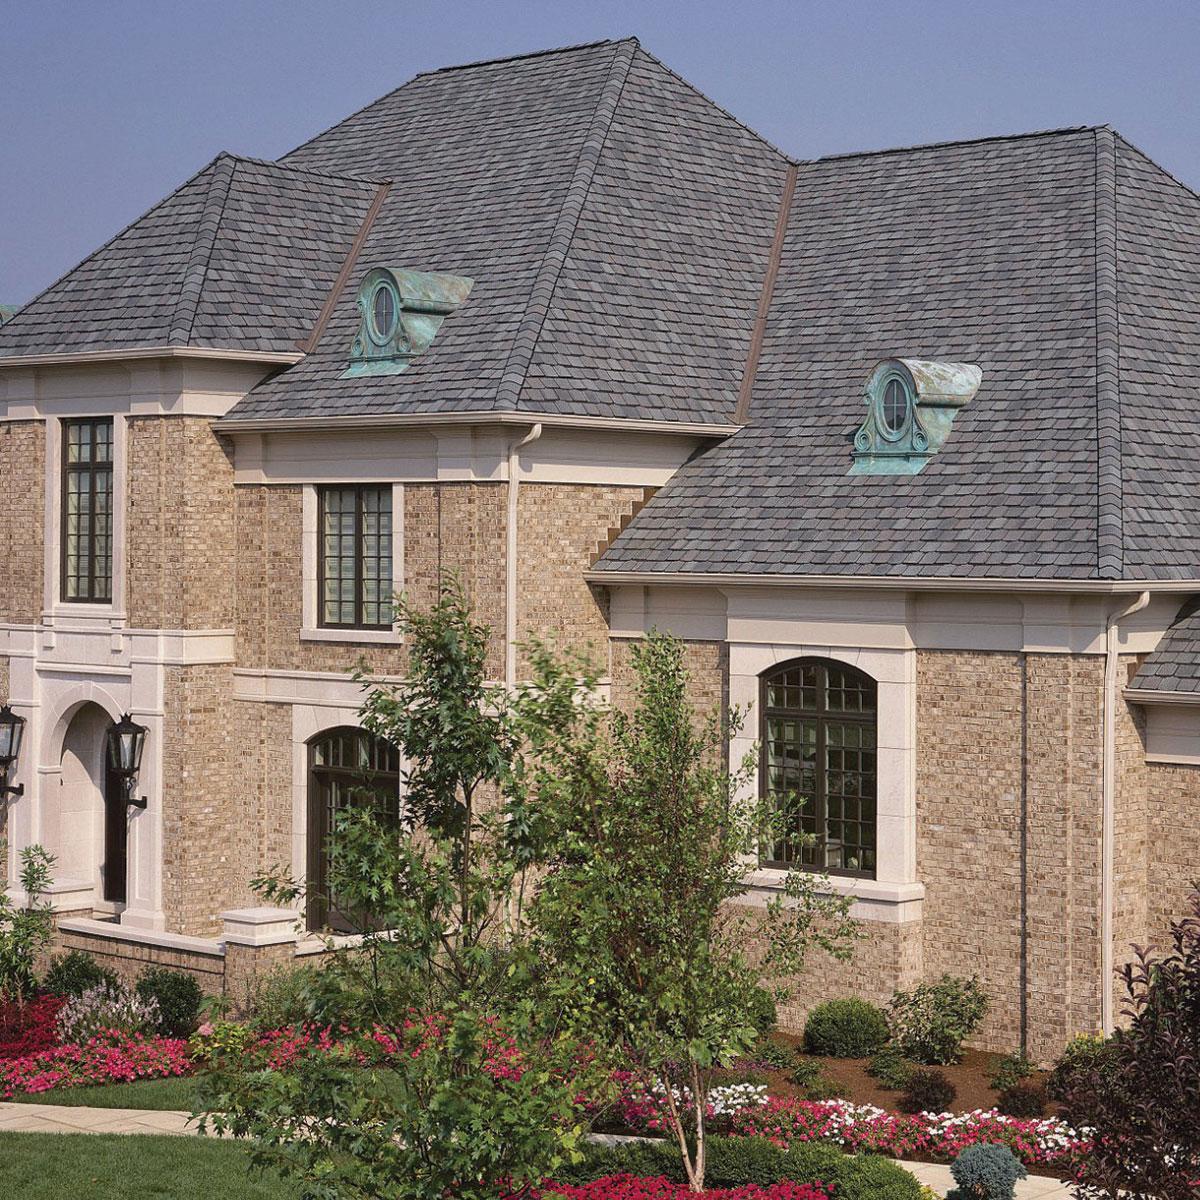 Grand Manor Brownstone - CERTAINTEED